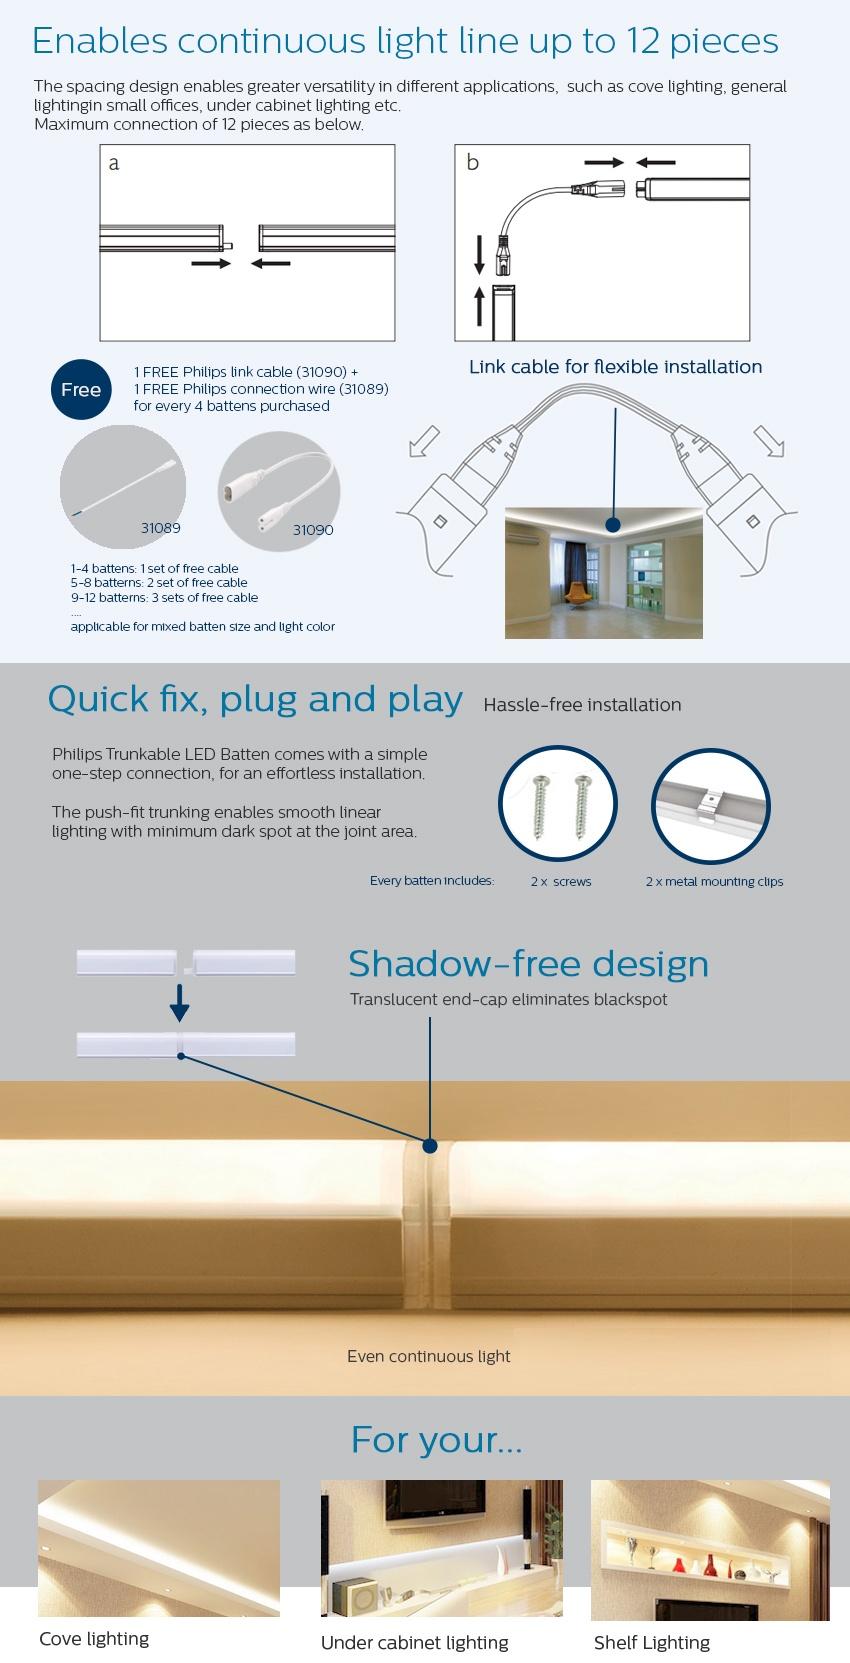 Philips 31092 Trunkable Linea LED Batten Wall Light/Cove Light 60cm  (7W/500lm) 3000K Warm White